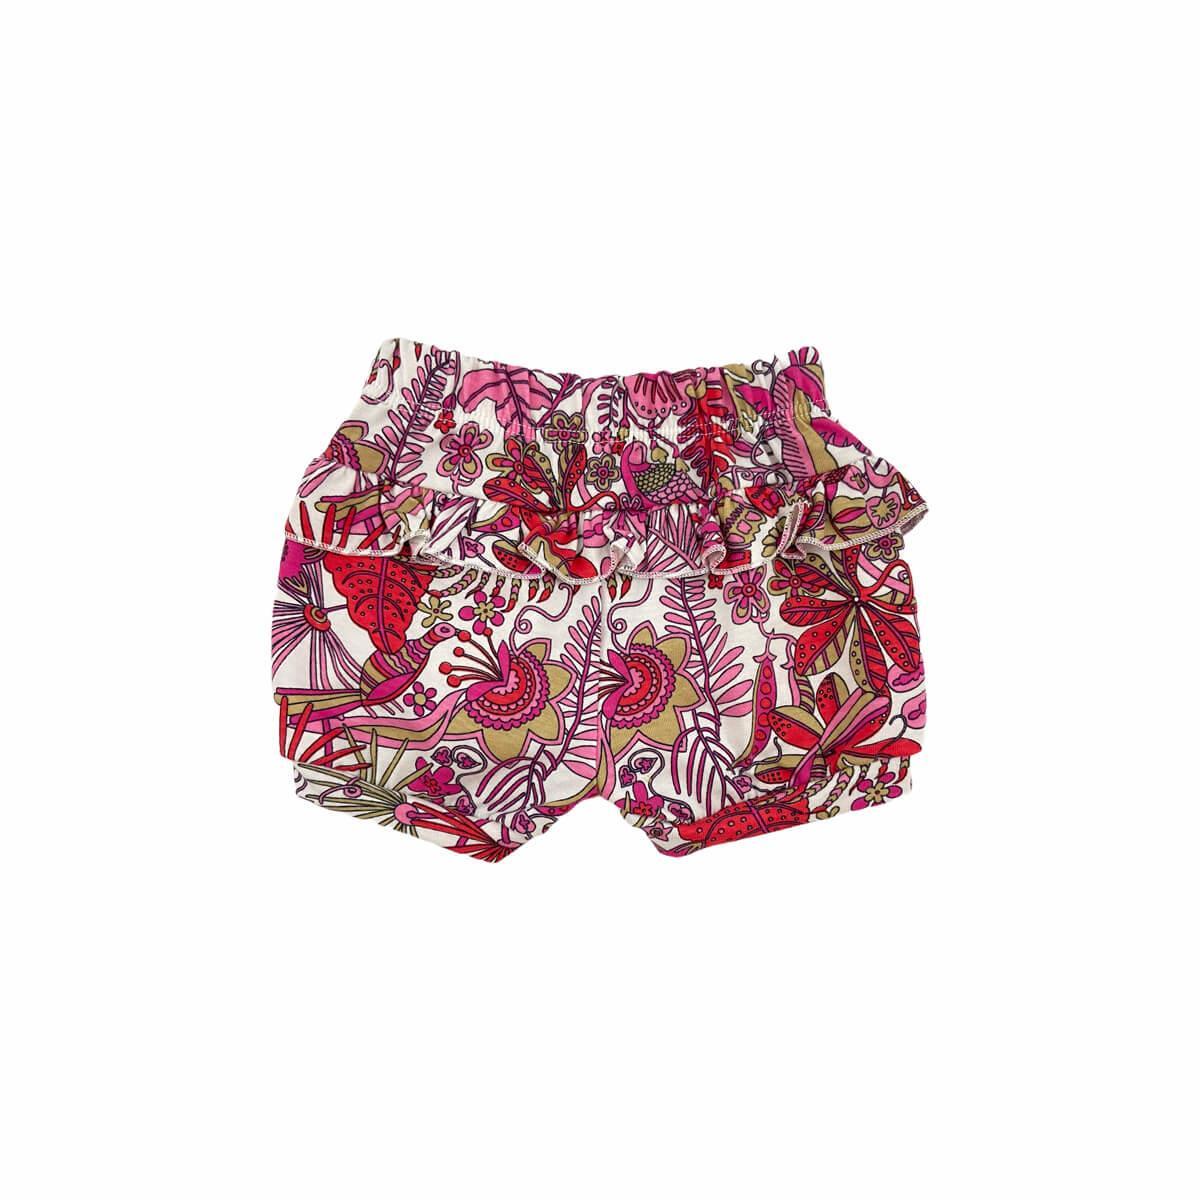 Shorts Feminino Folhas Meia Malha 100% Algodão